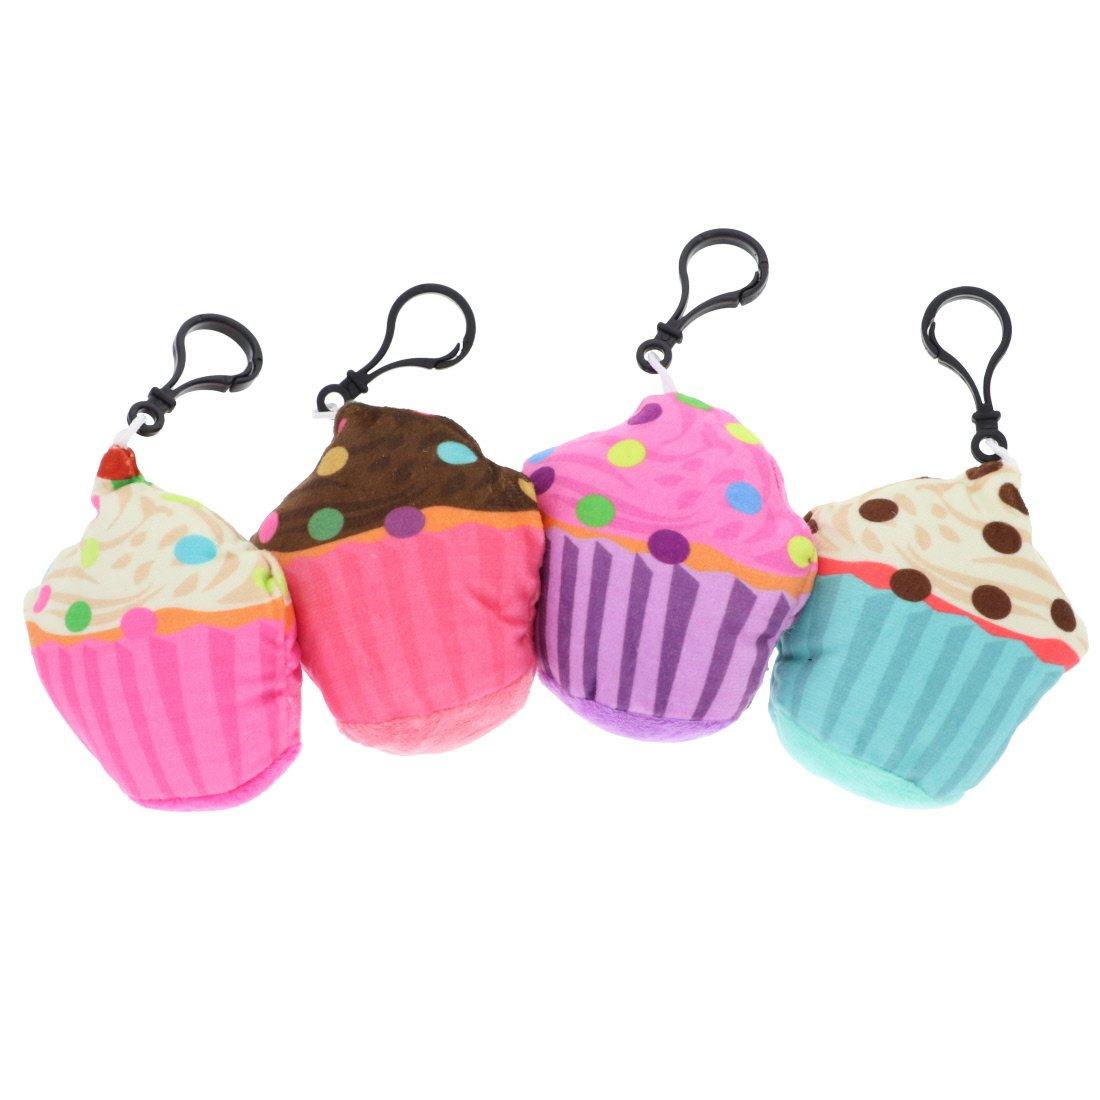 Plush Cupcake Backpack Charm - Set of 4